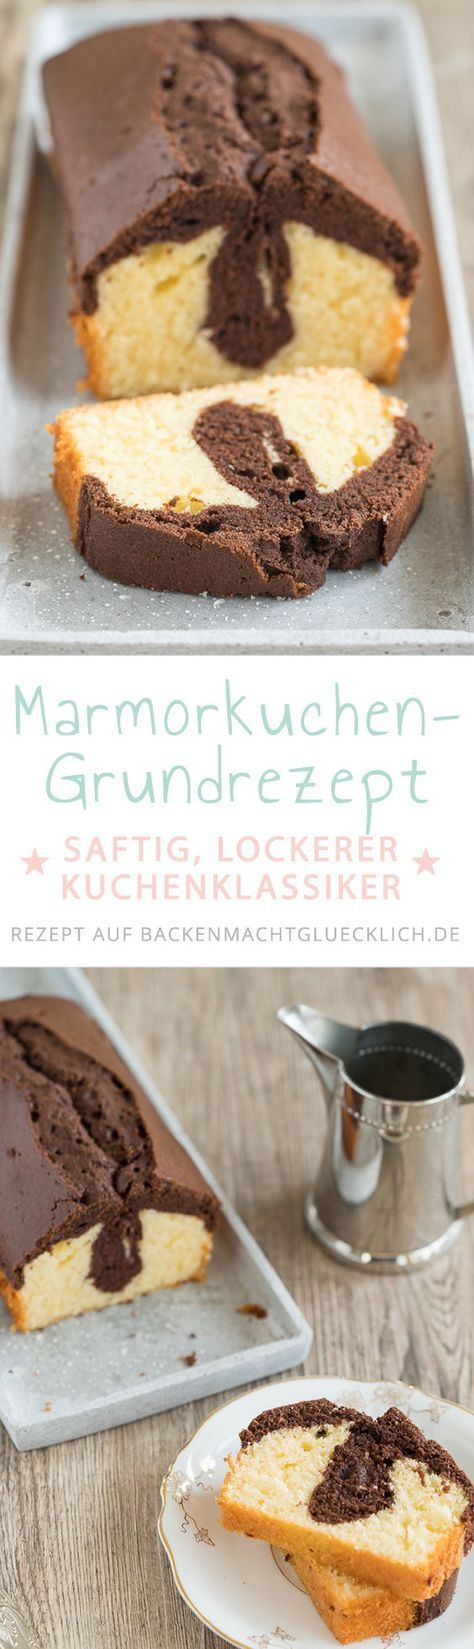 Marmorkuchen Grundrezept #cupcakefrostingtips